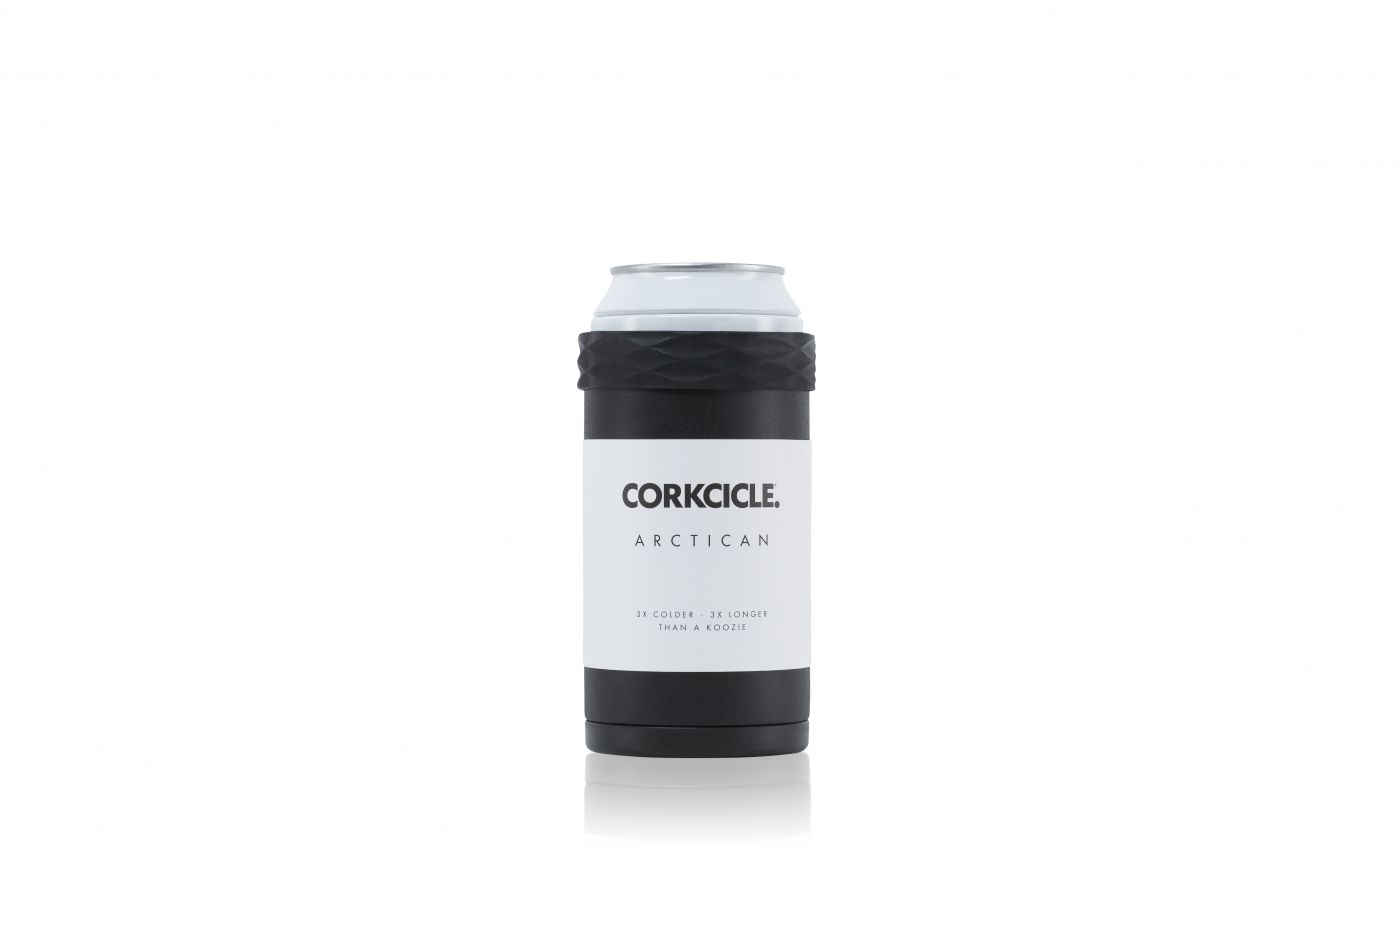 Corkcicle Artican